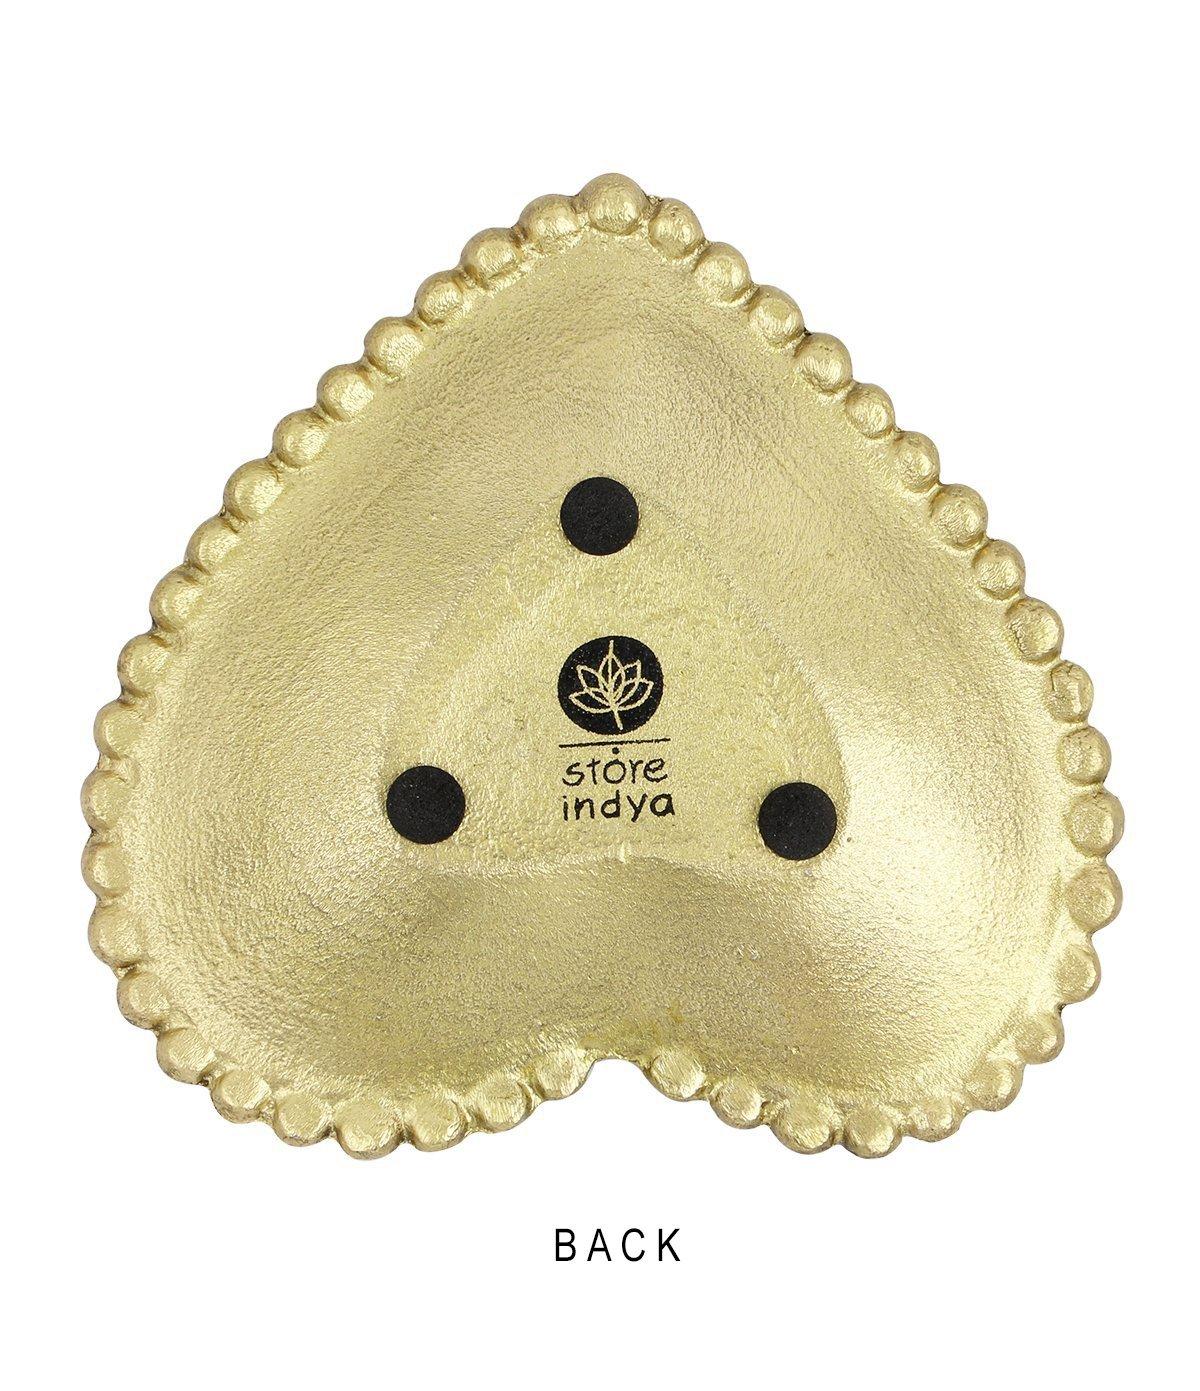 Heart Store Indya Handcrafted Trinket Dish Accessories Decorative Jewelry Dish Kitchen Dinning Serveware Accessories